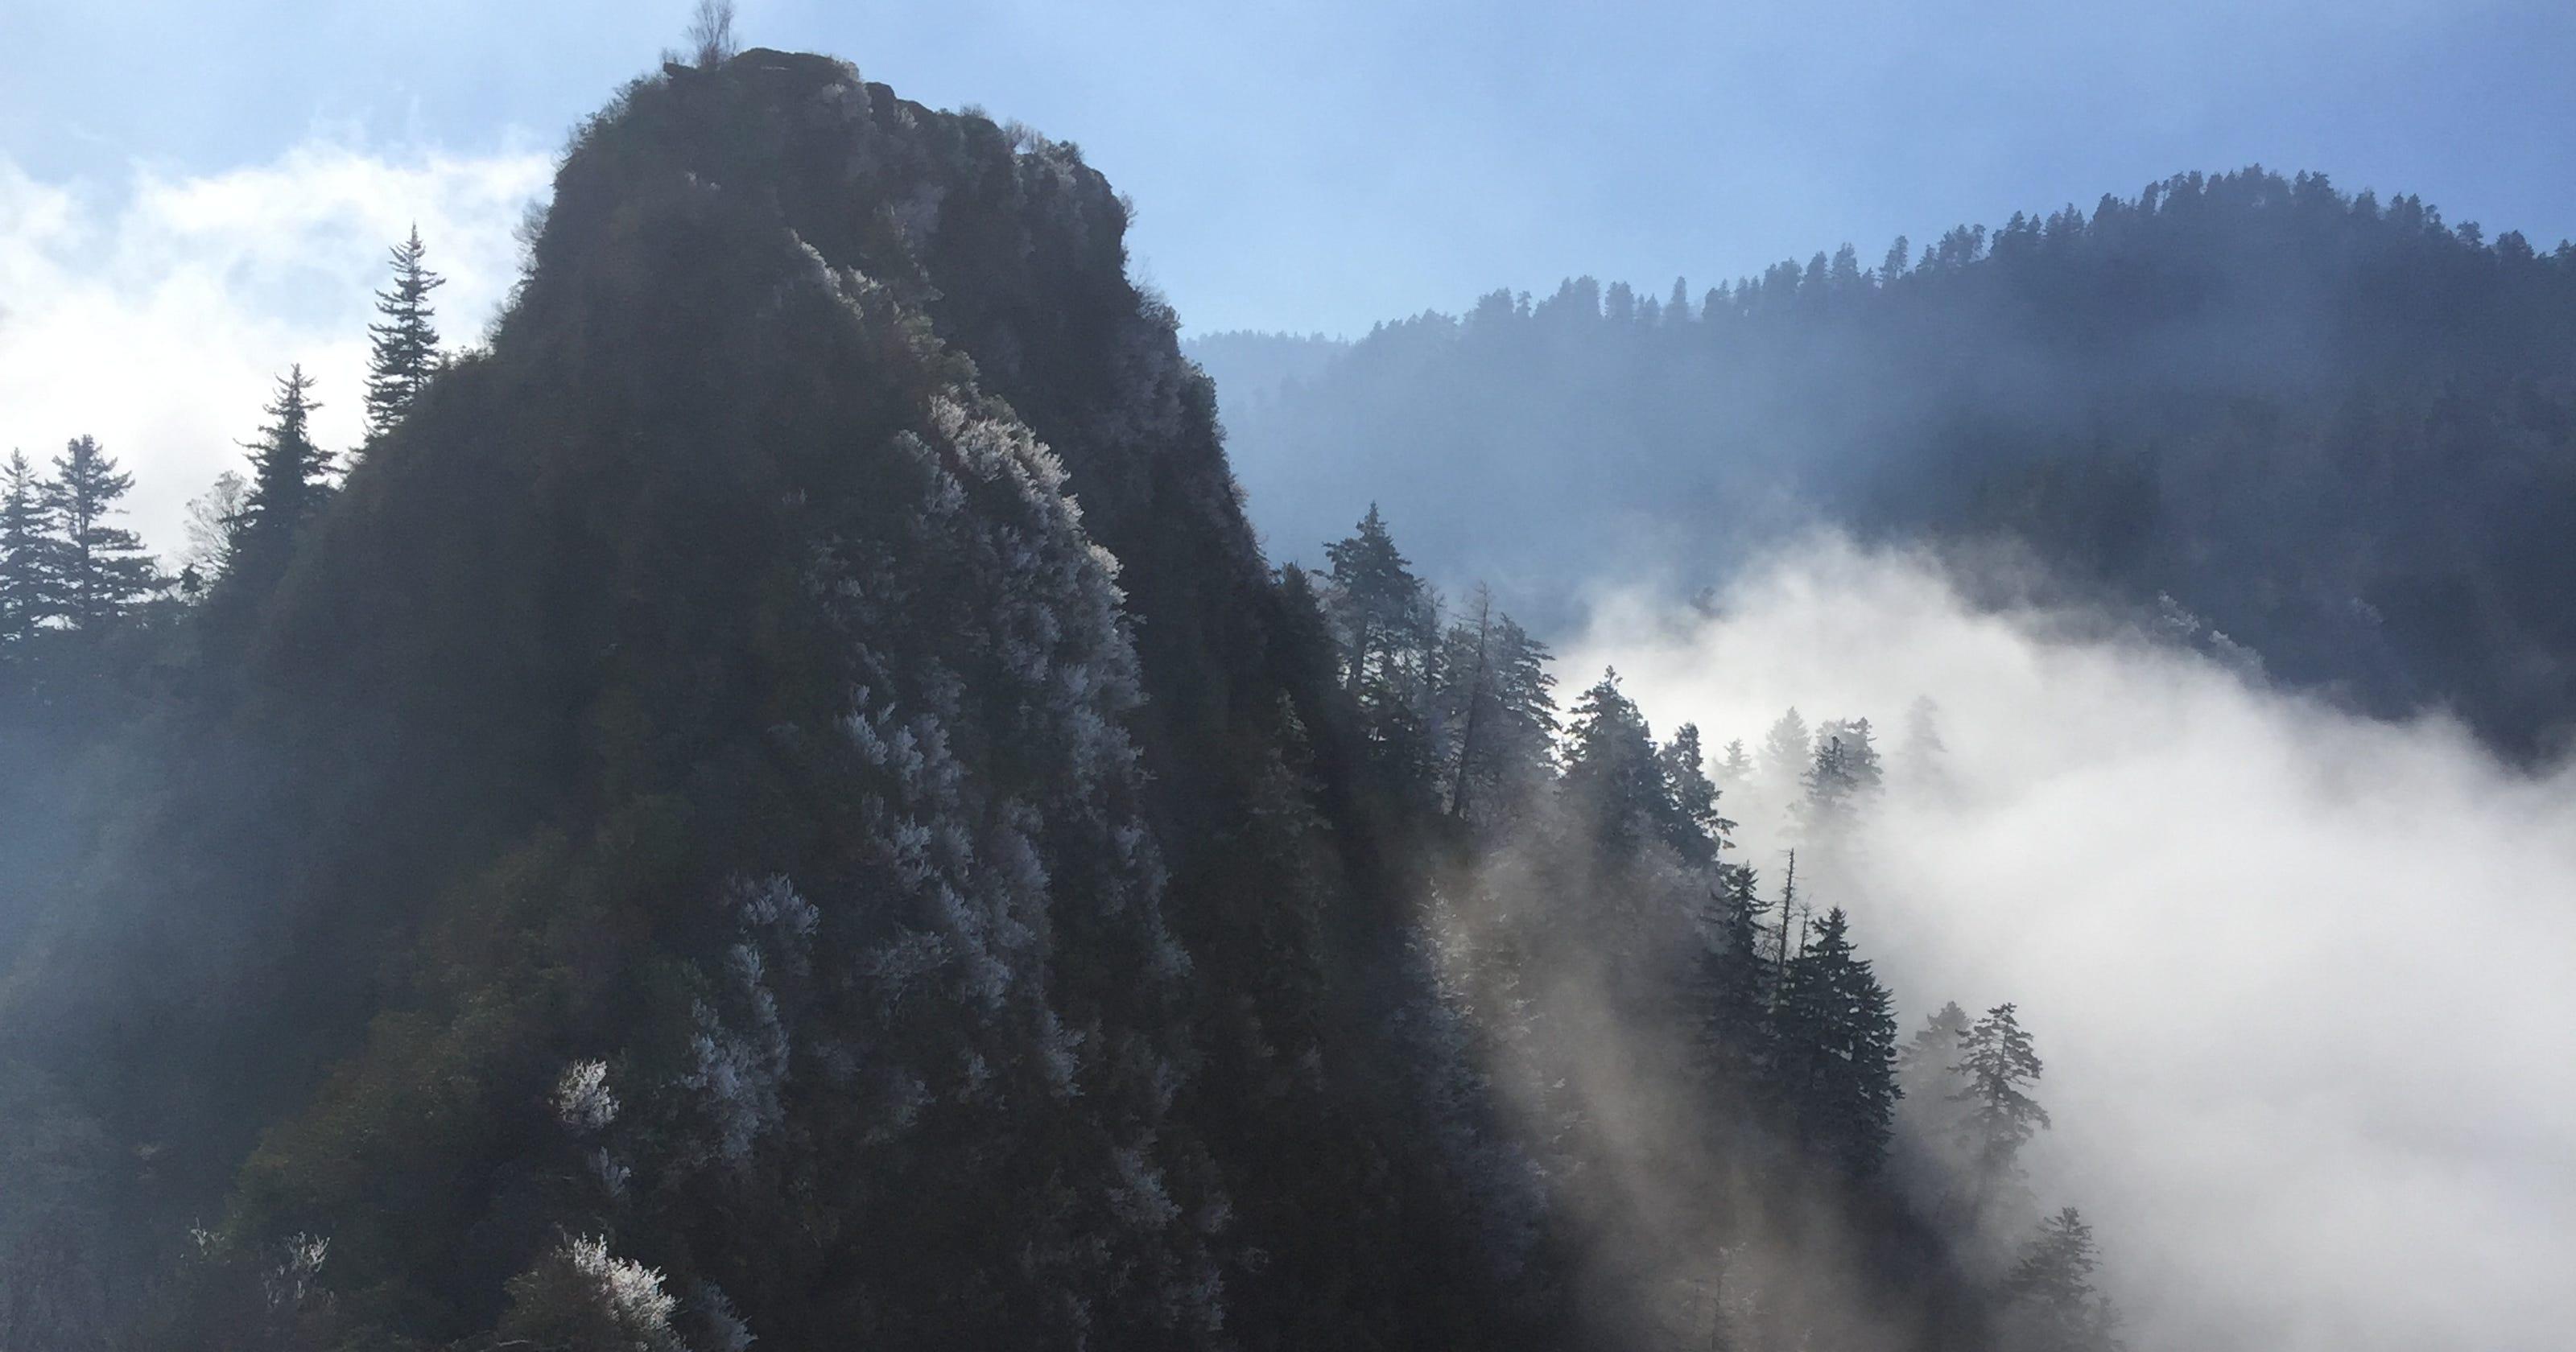 Gatlinburg wildfire began as a harmless spark